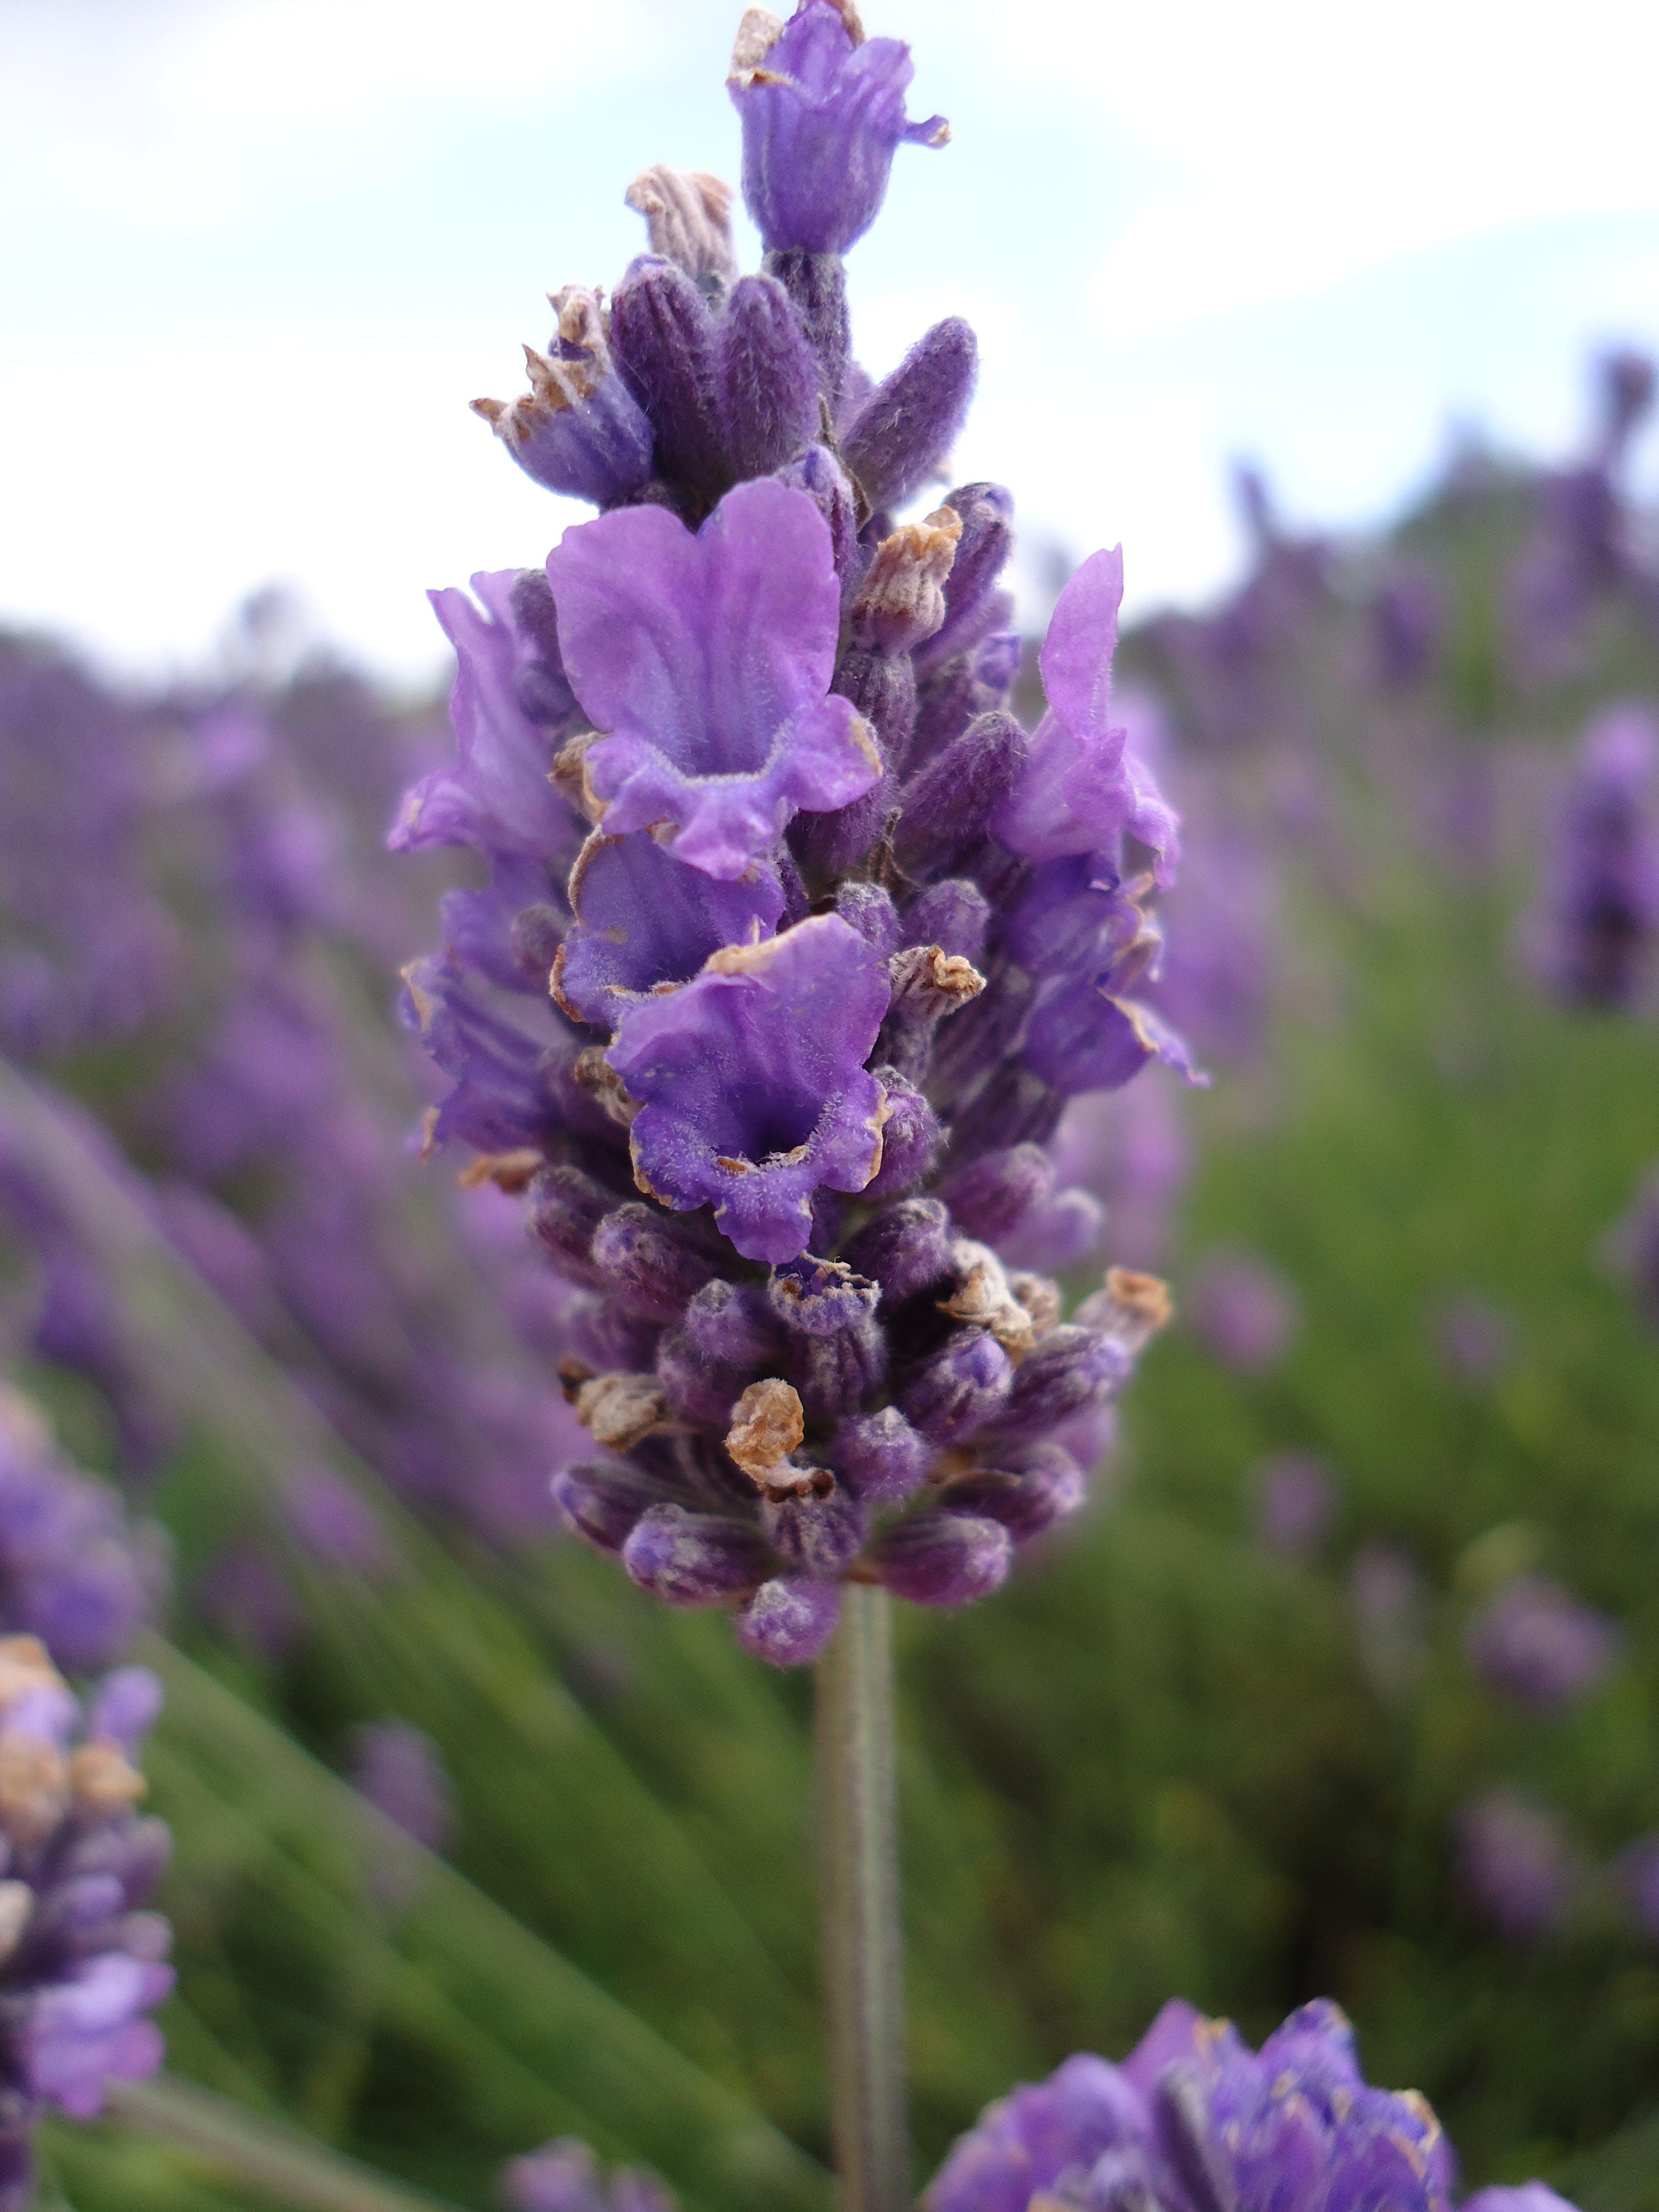 Free stock photo of lavender